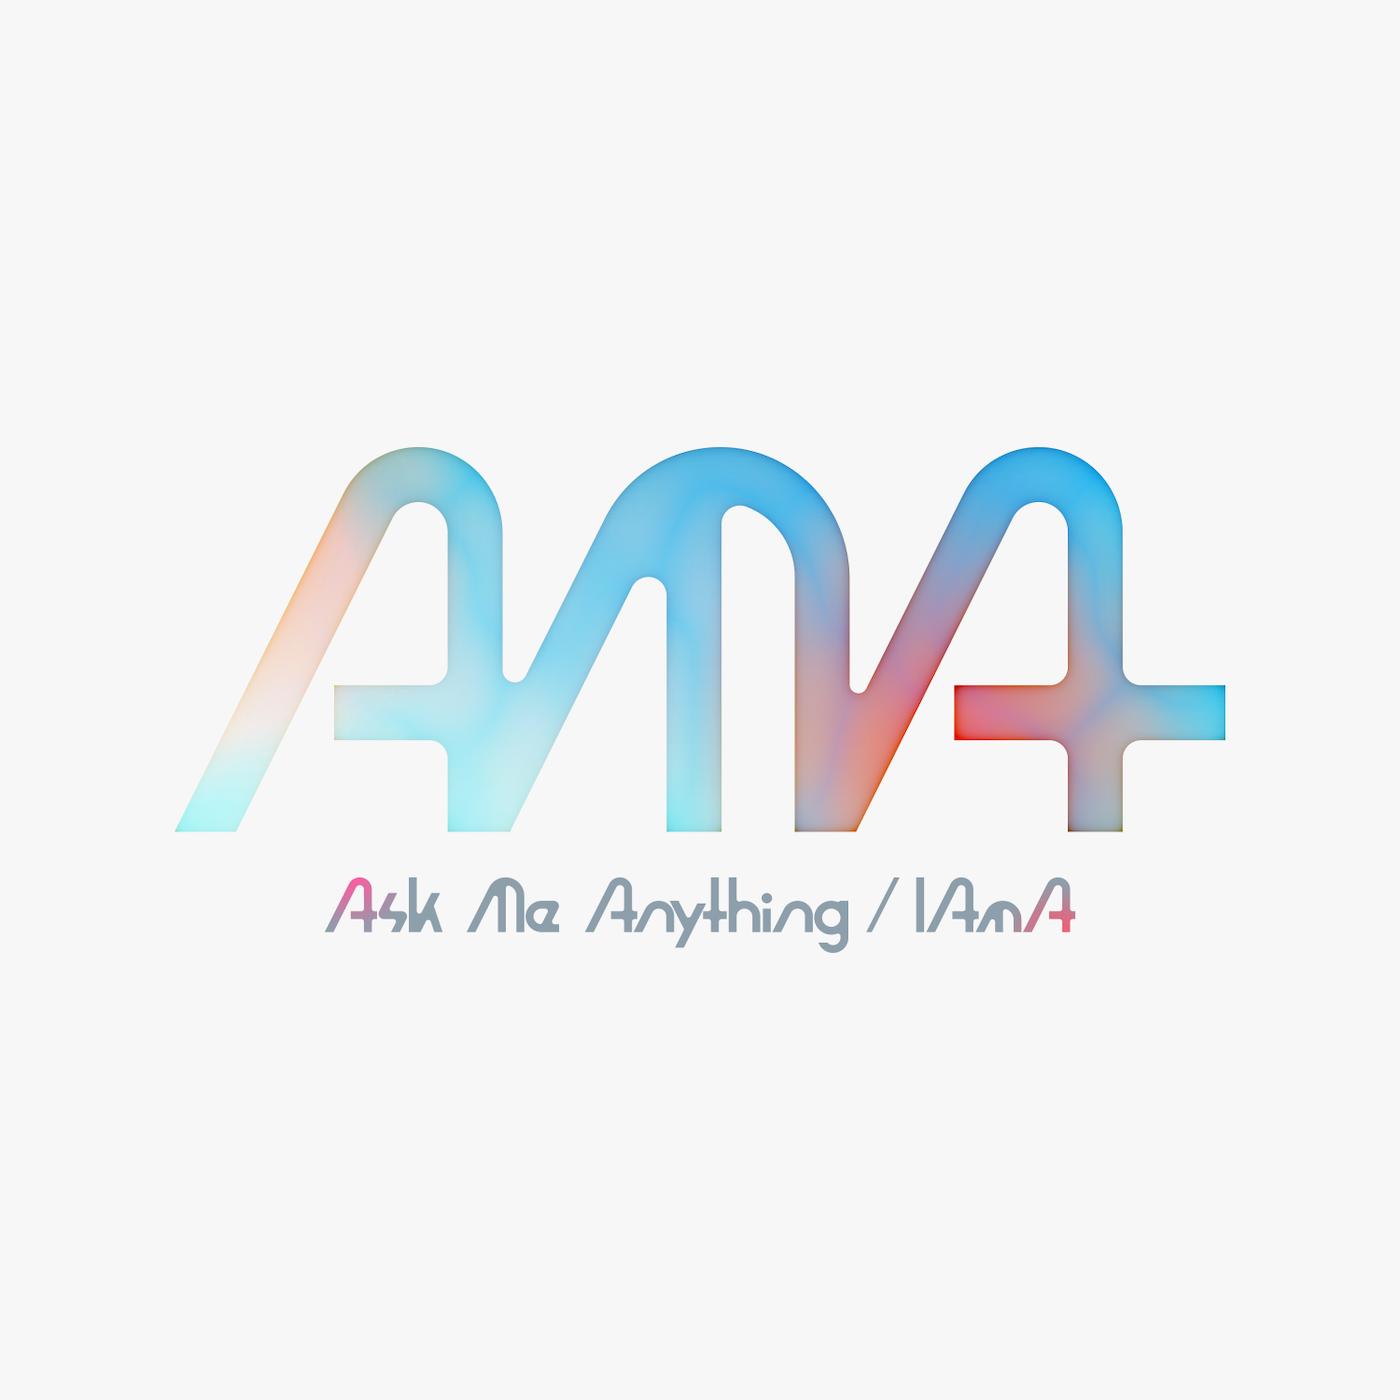 AMA Ask Me Anything / IAmA(タイトルデザイン)